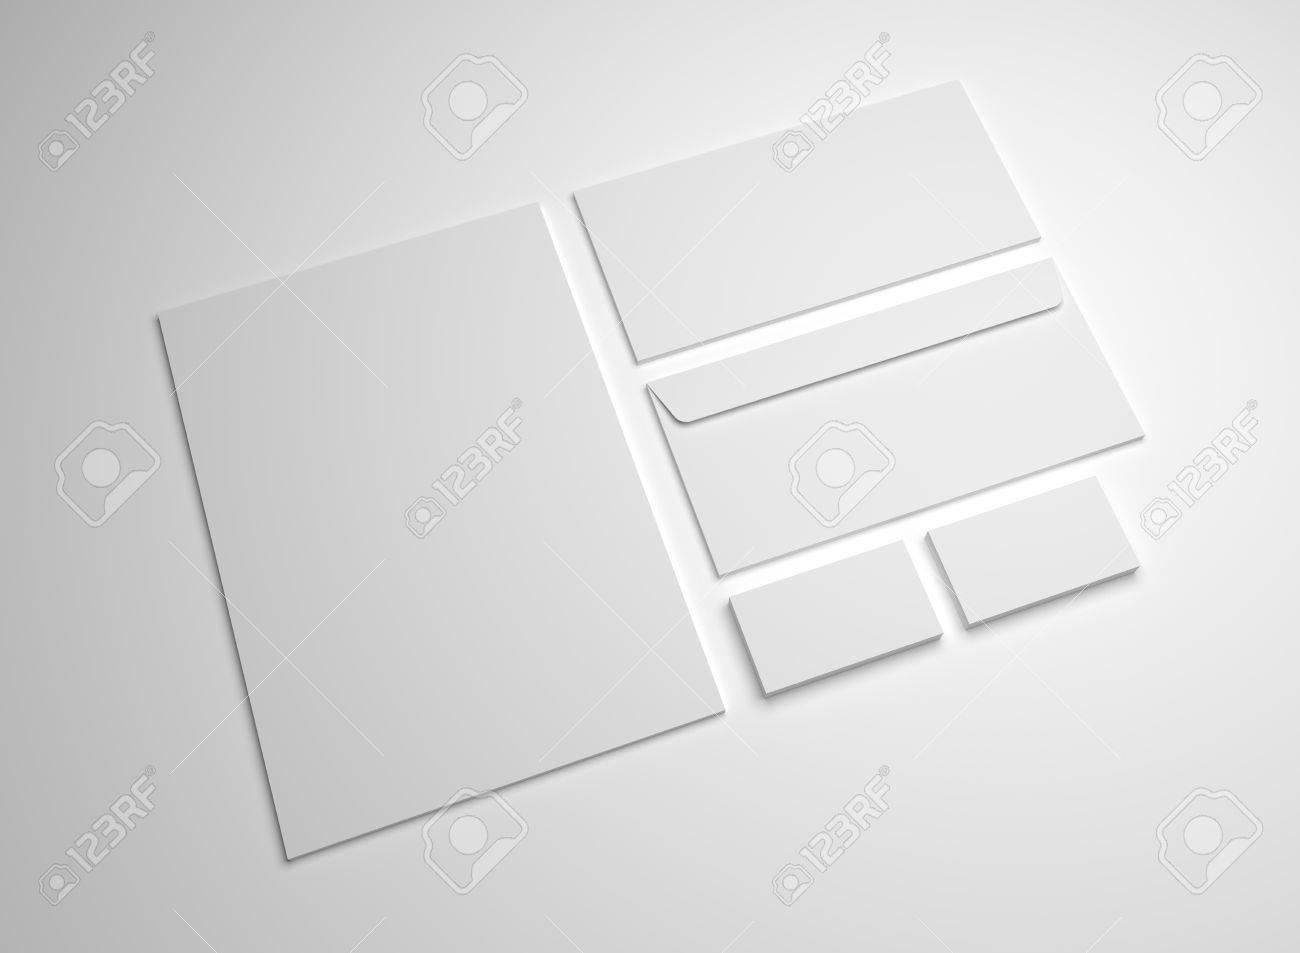 Stationery Mockup 3d Illustration. Blank White A4 Letter, Business ...